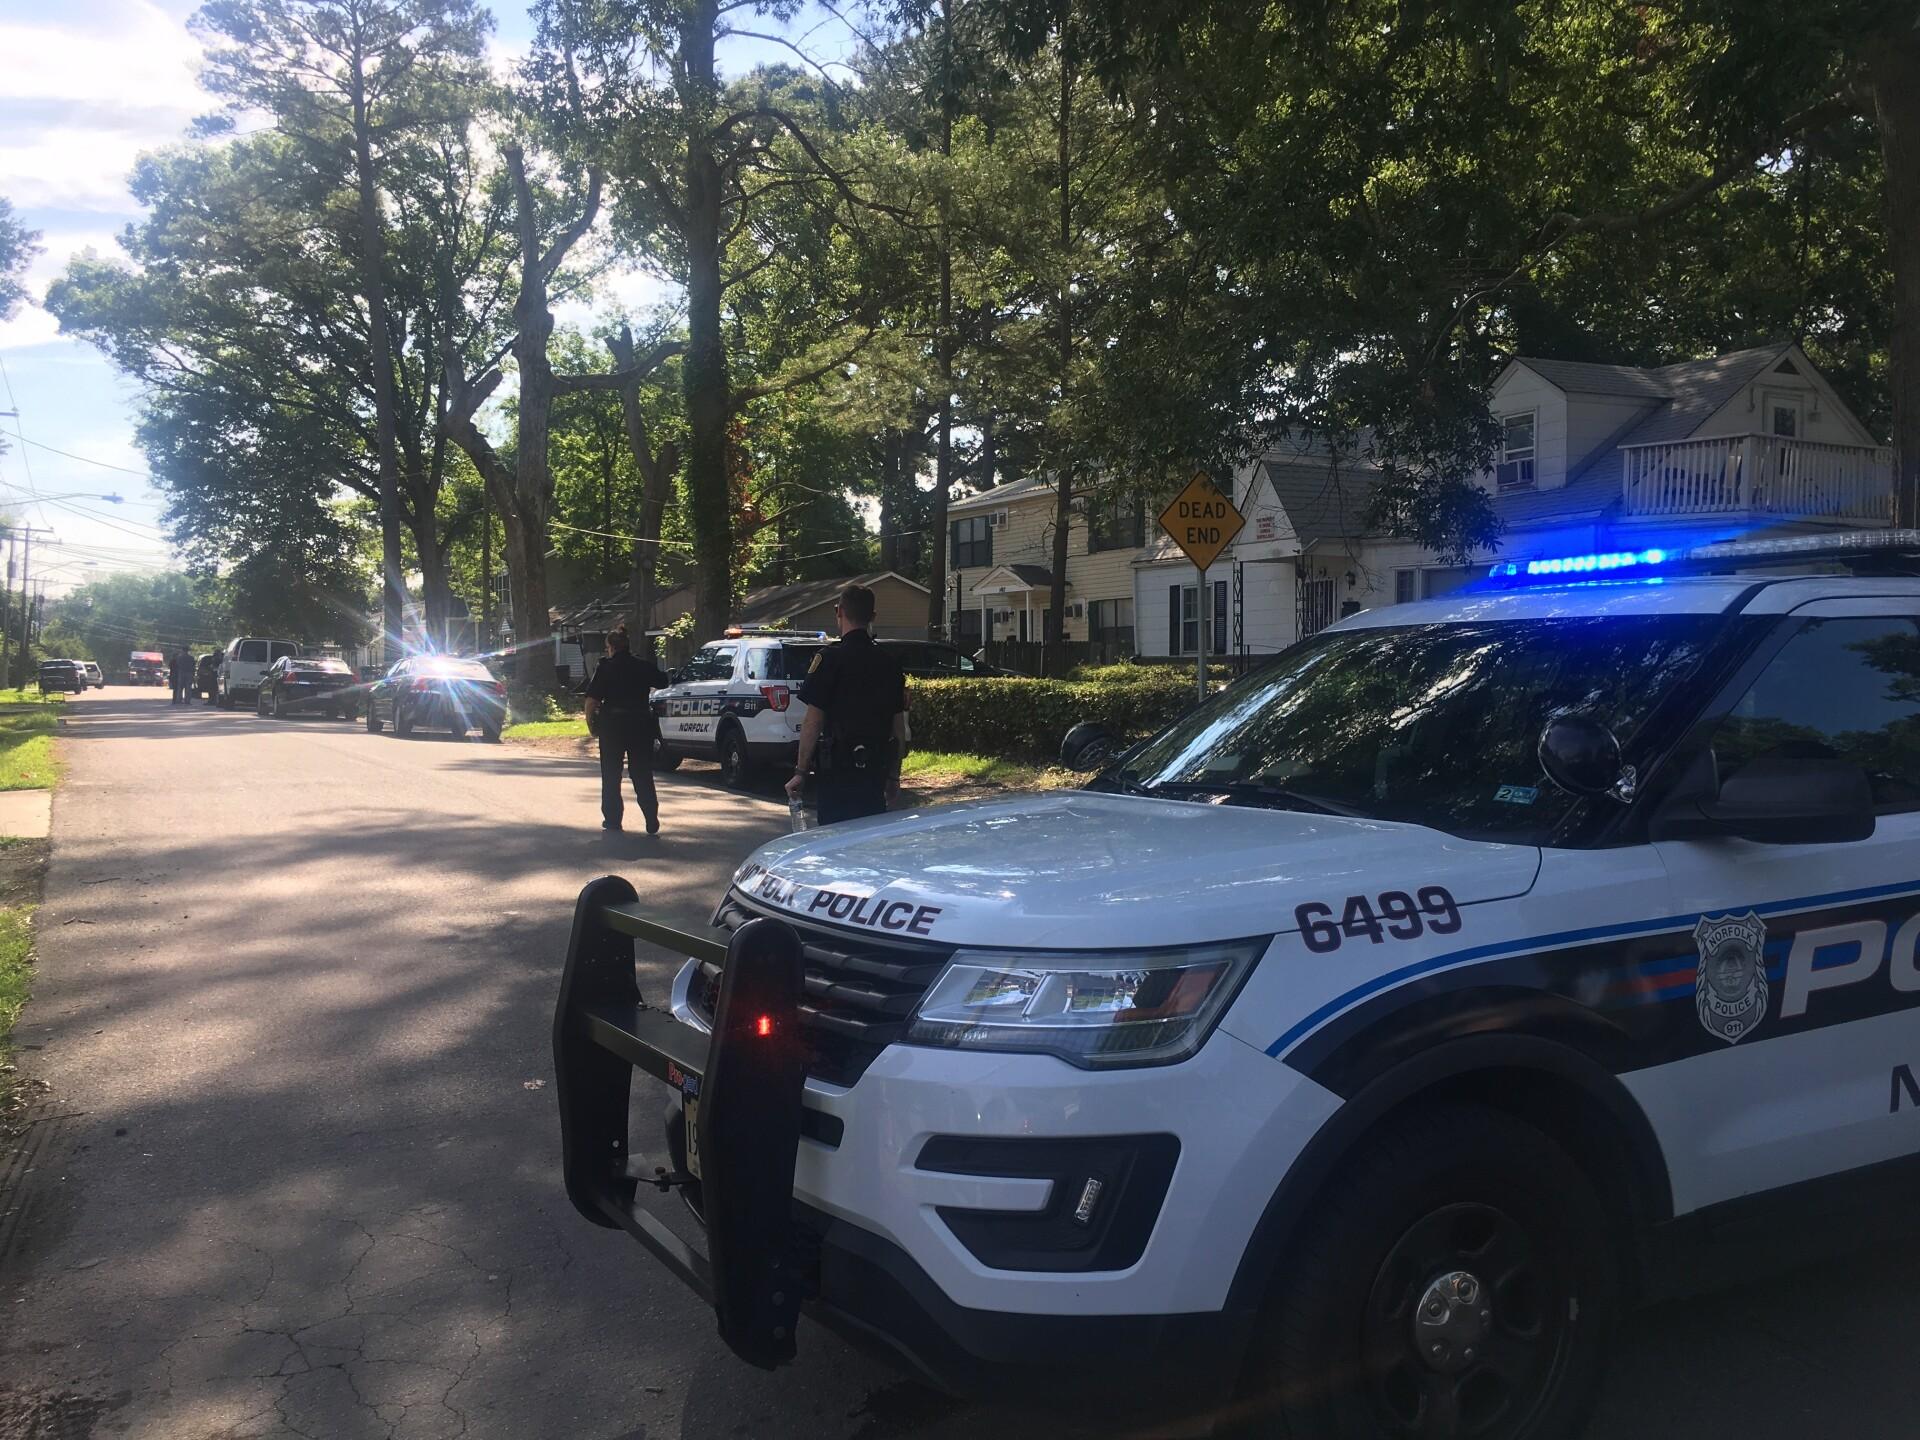 Photos: Man found dead inside Norfolk home after fire; detectives arrest homicide suspect afterchase